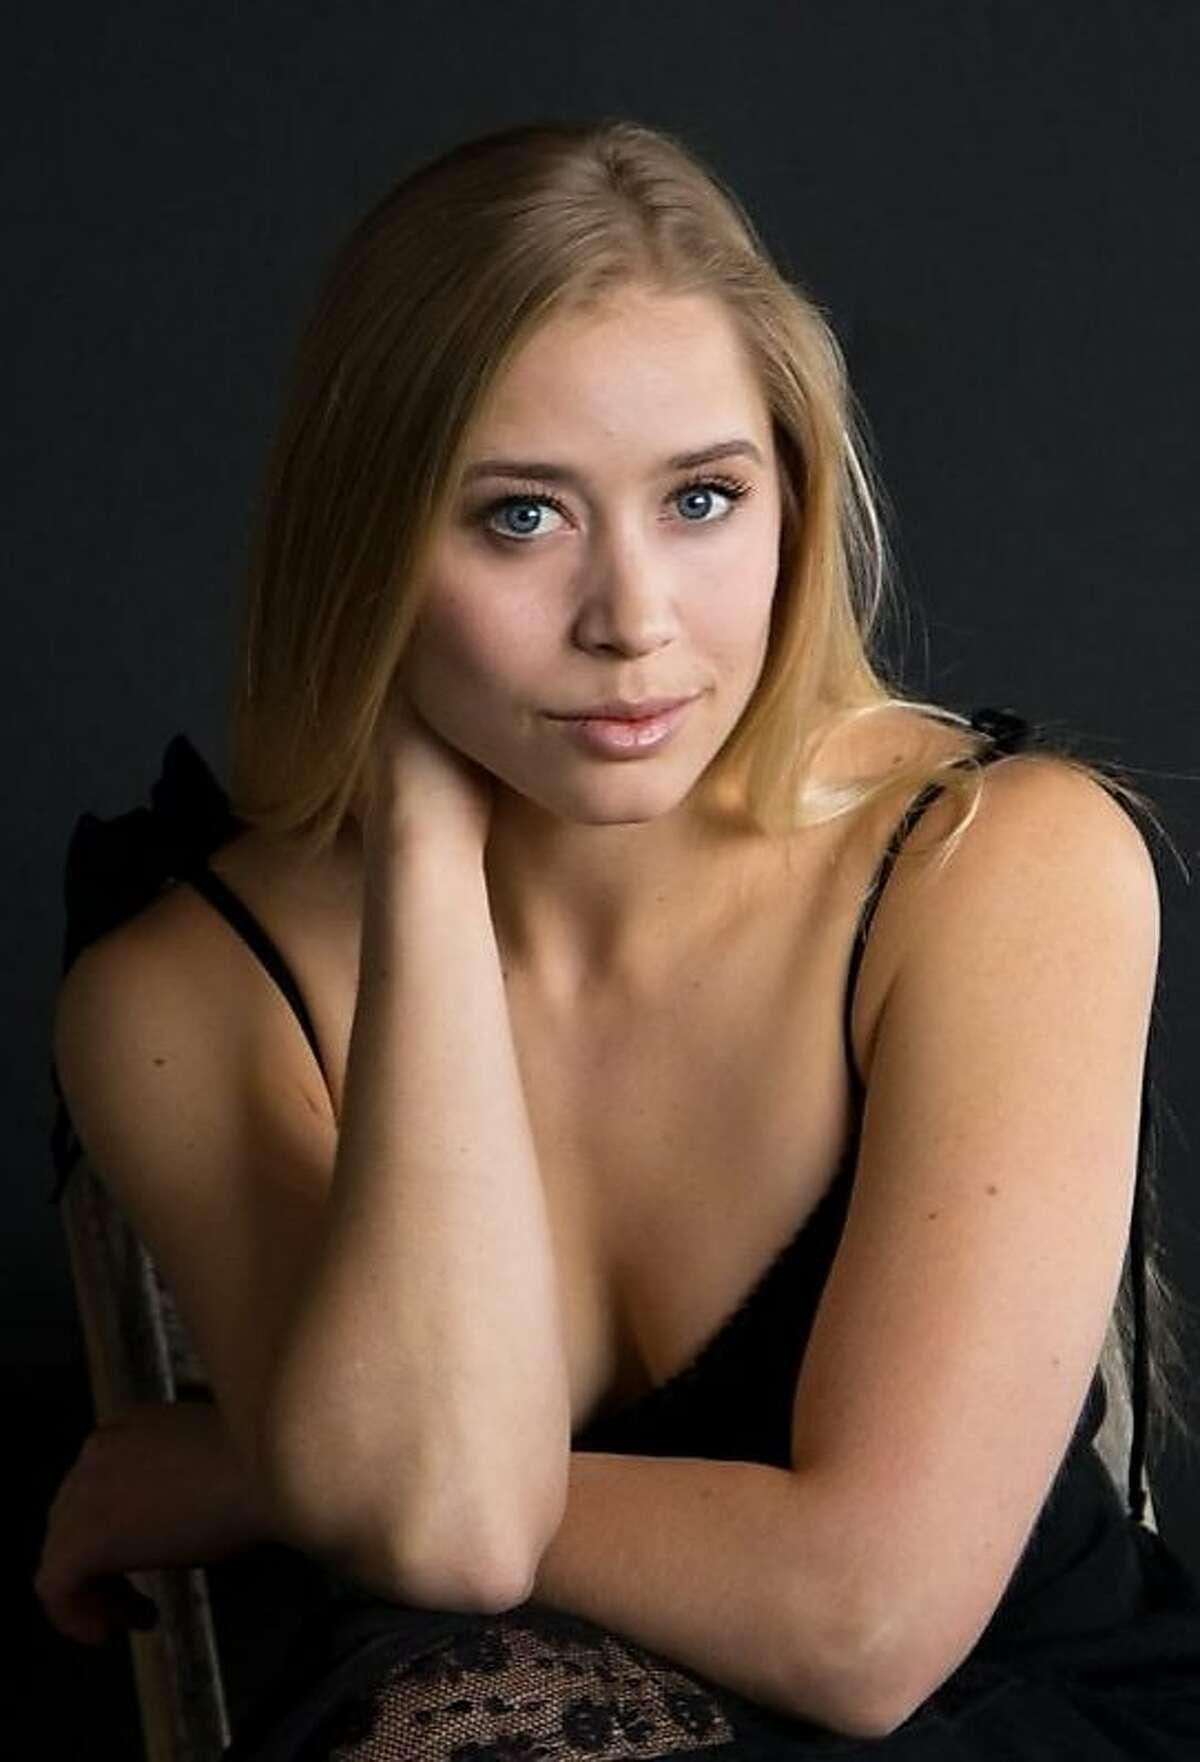 Singer Annie Sherman